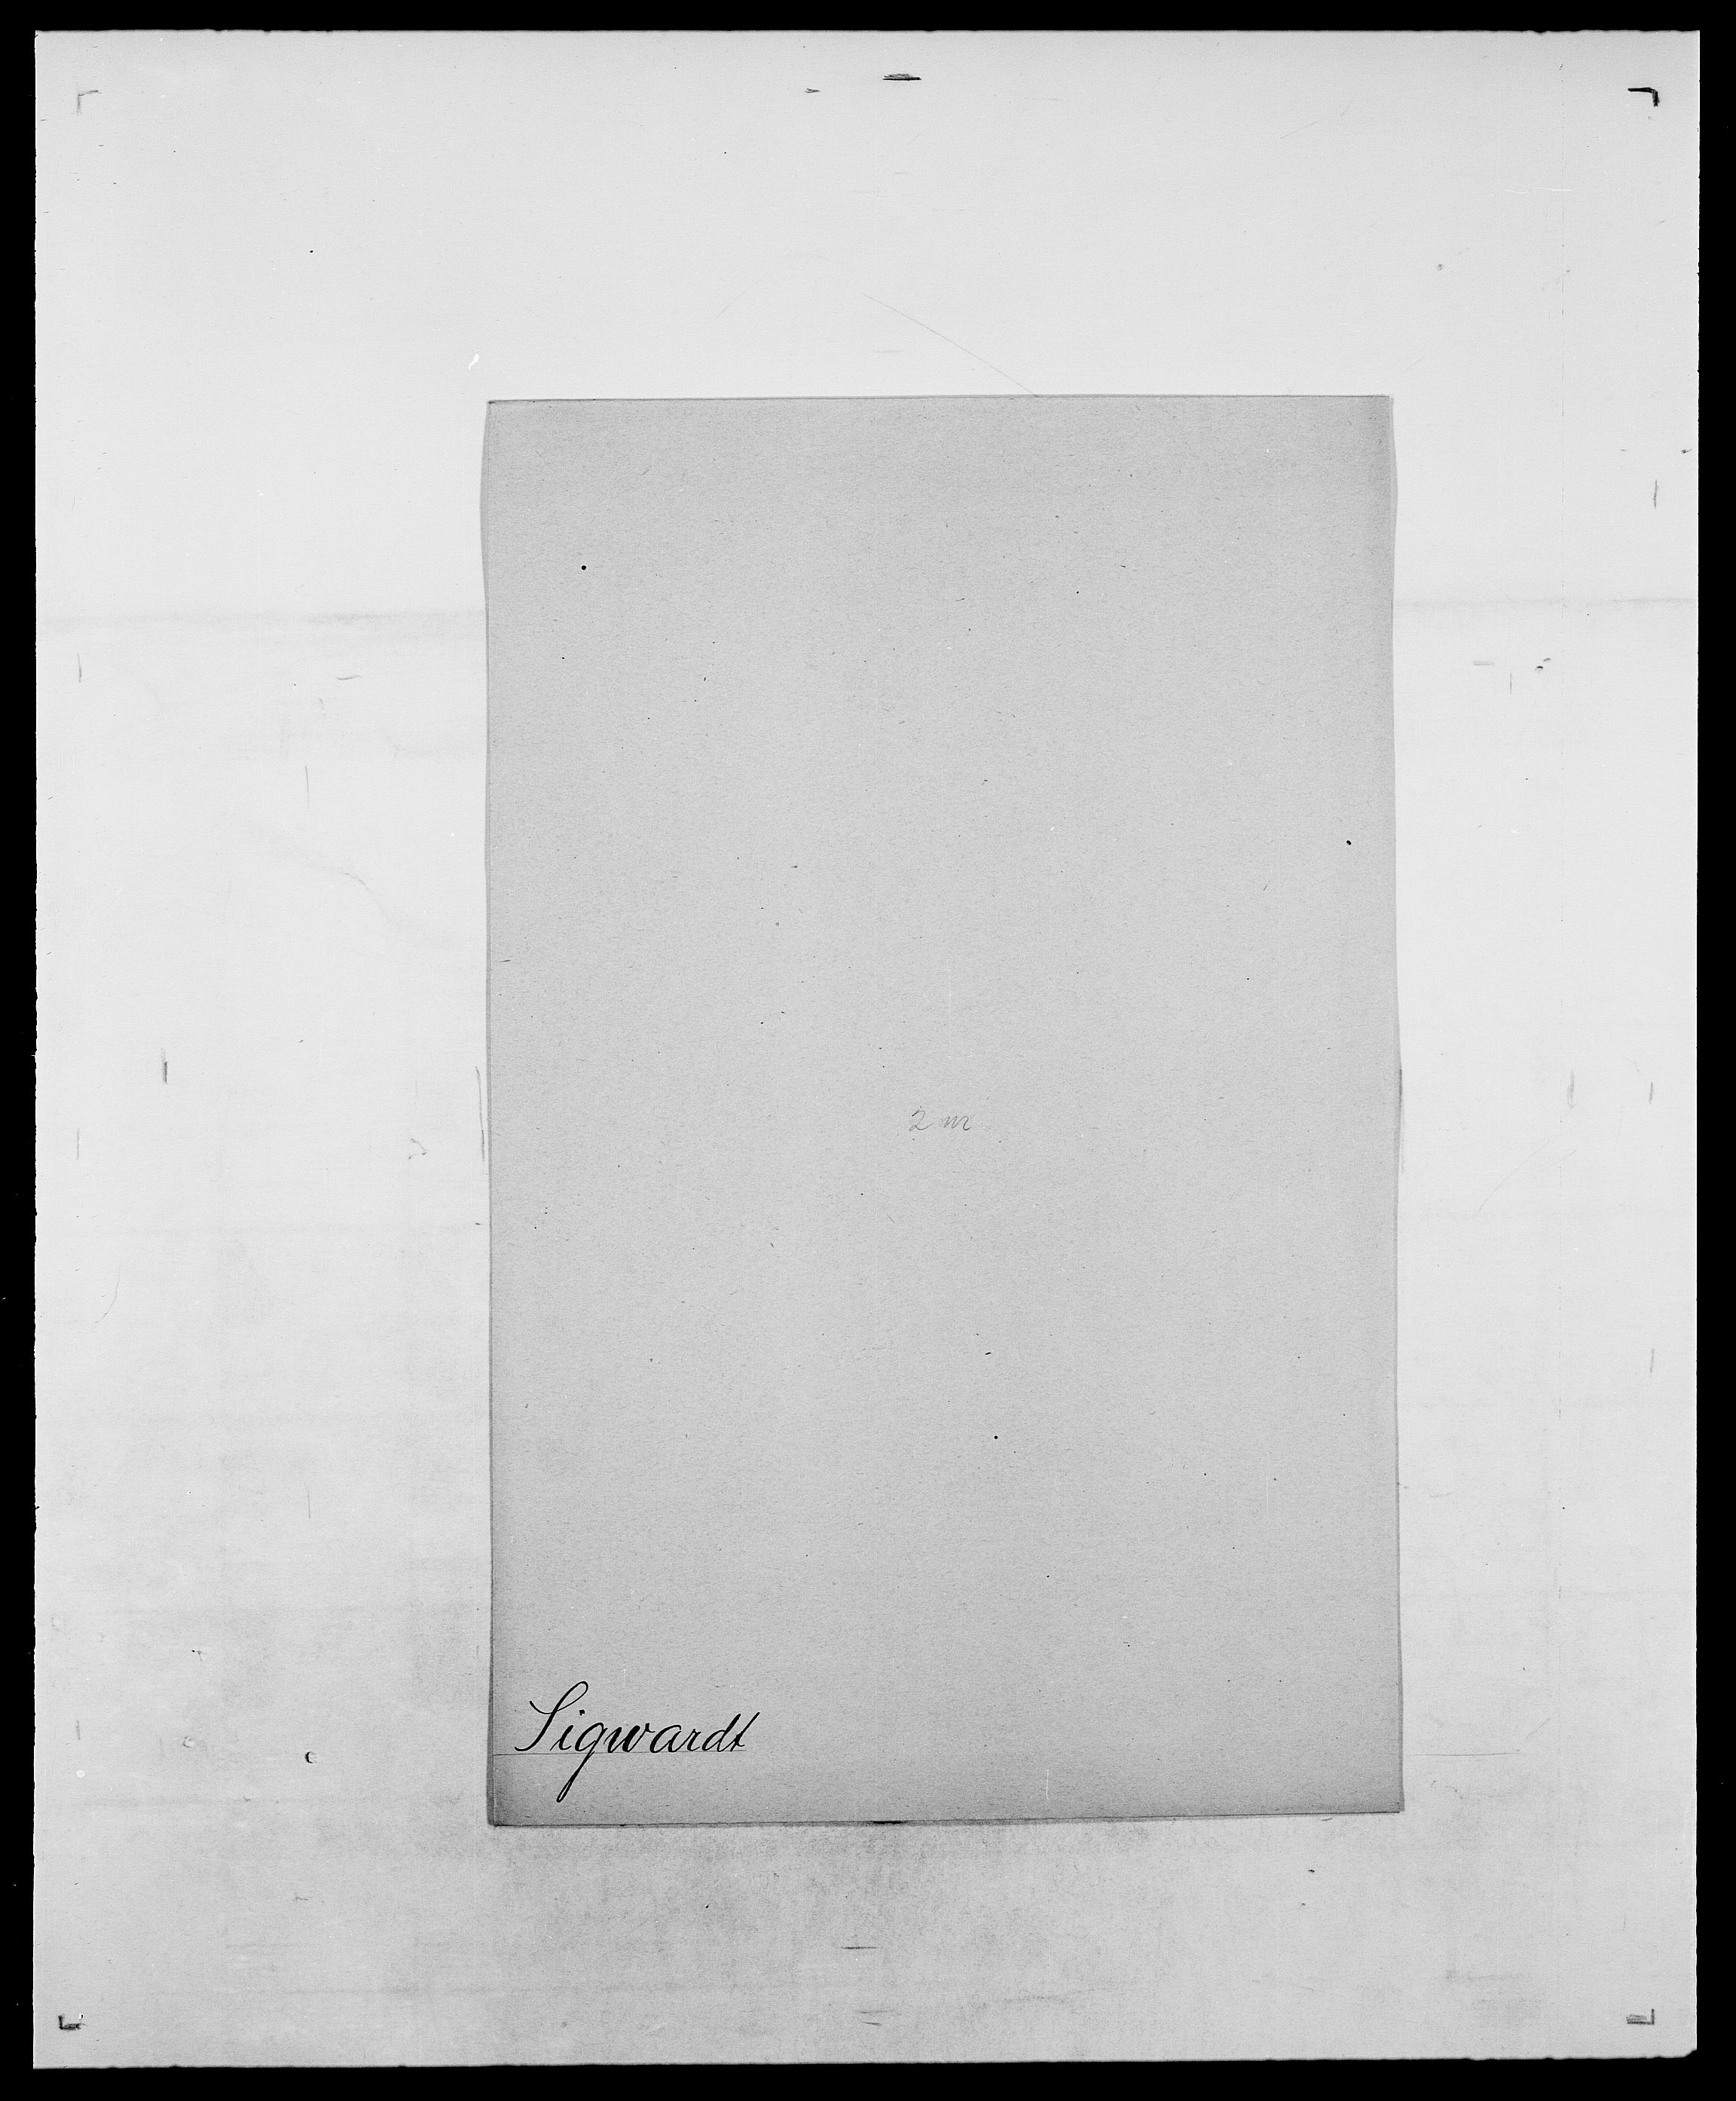 SAO, Delgobe, Charles Antoine - samling, D/Da/L0035: Schnabel - sjetman, s. 790